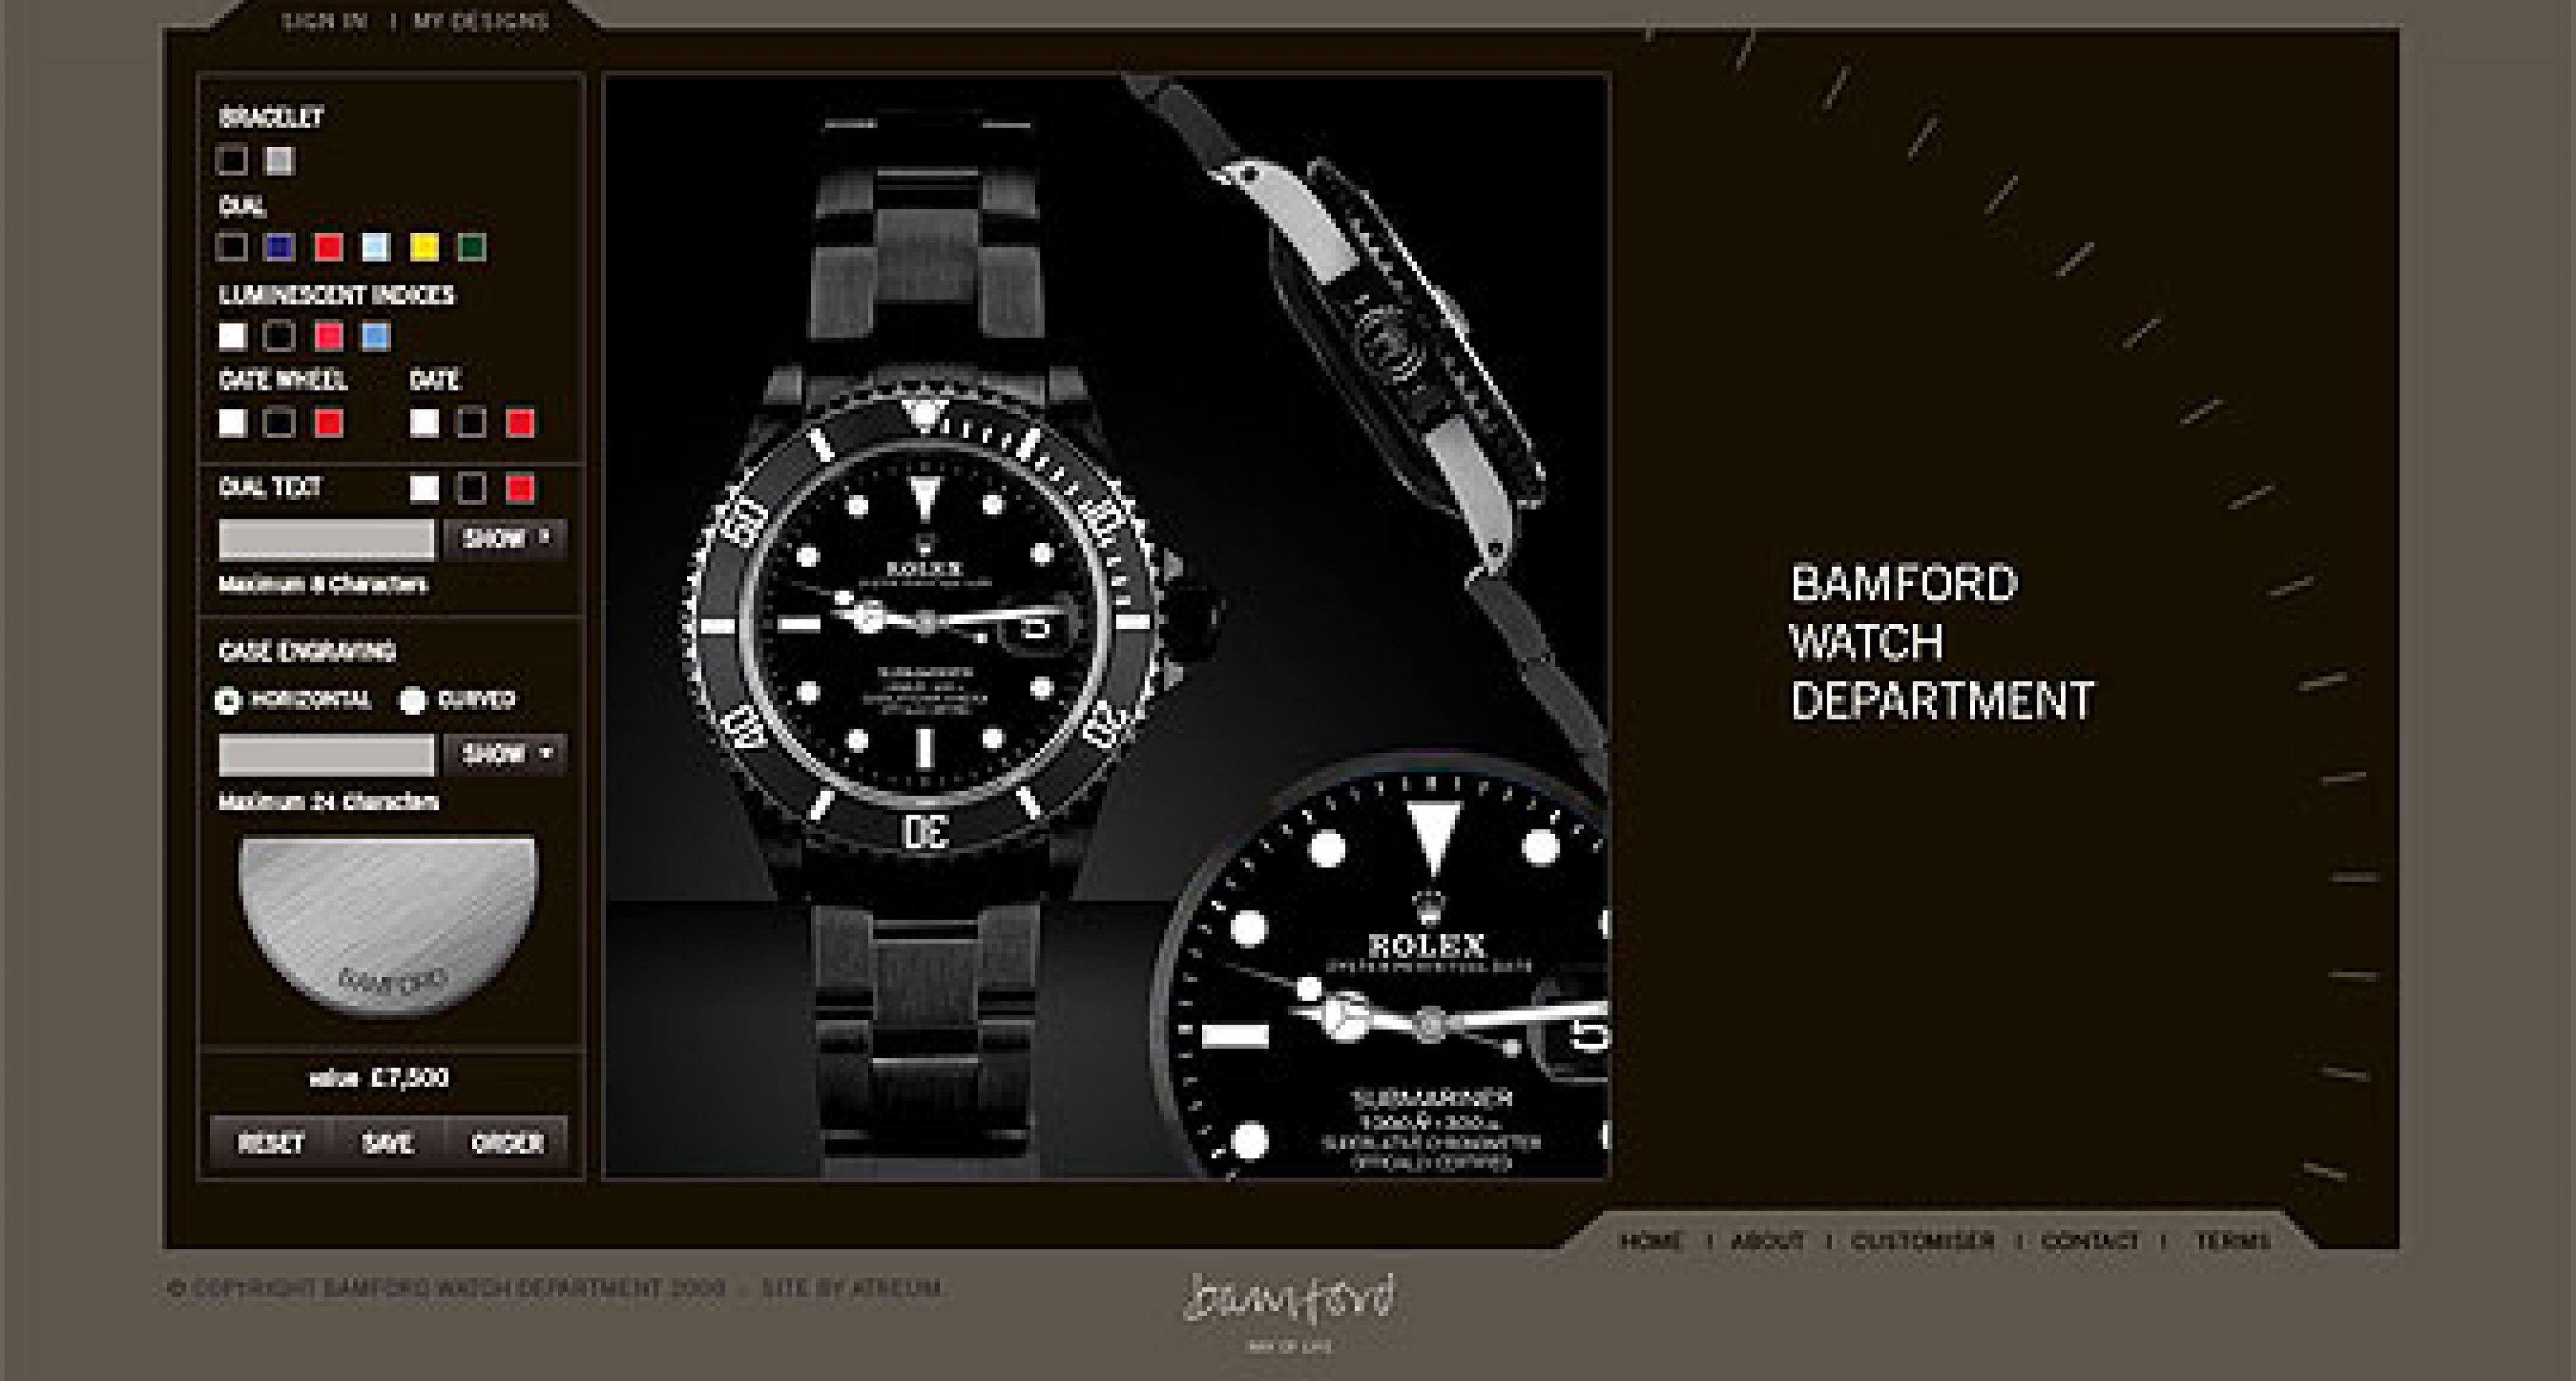 Bamford Watch Department: Now Online